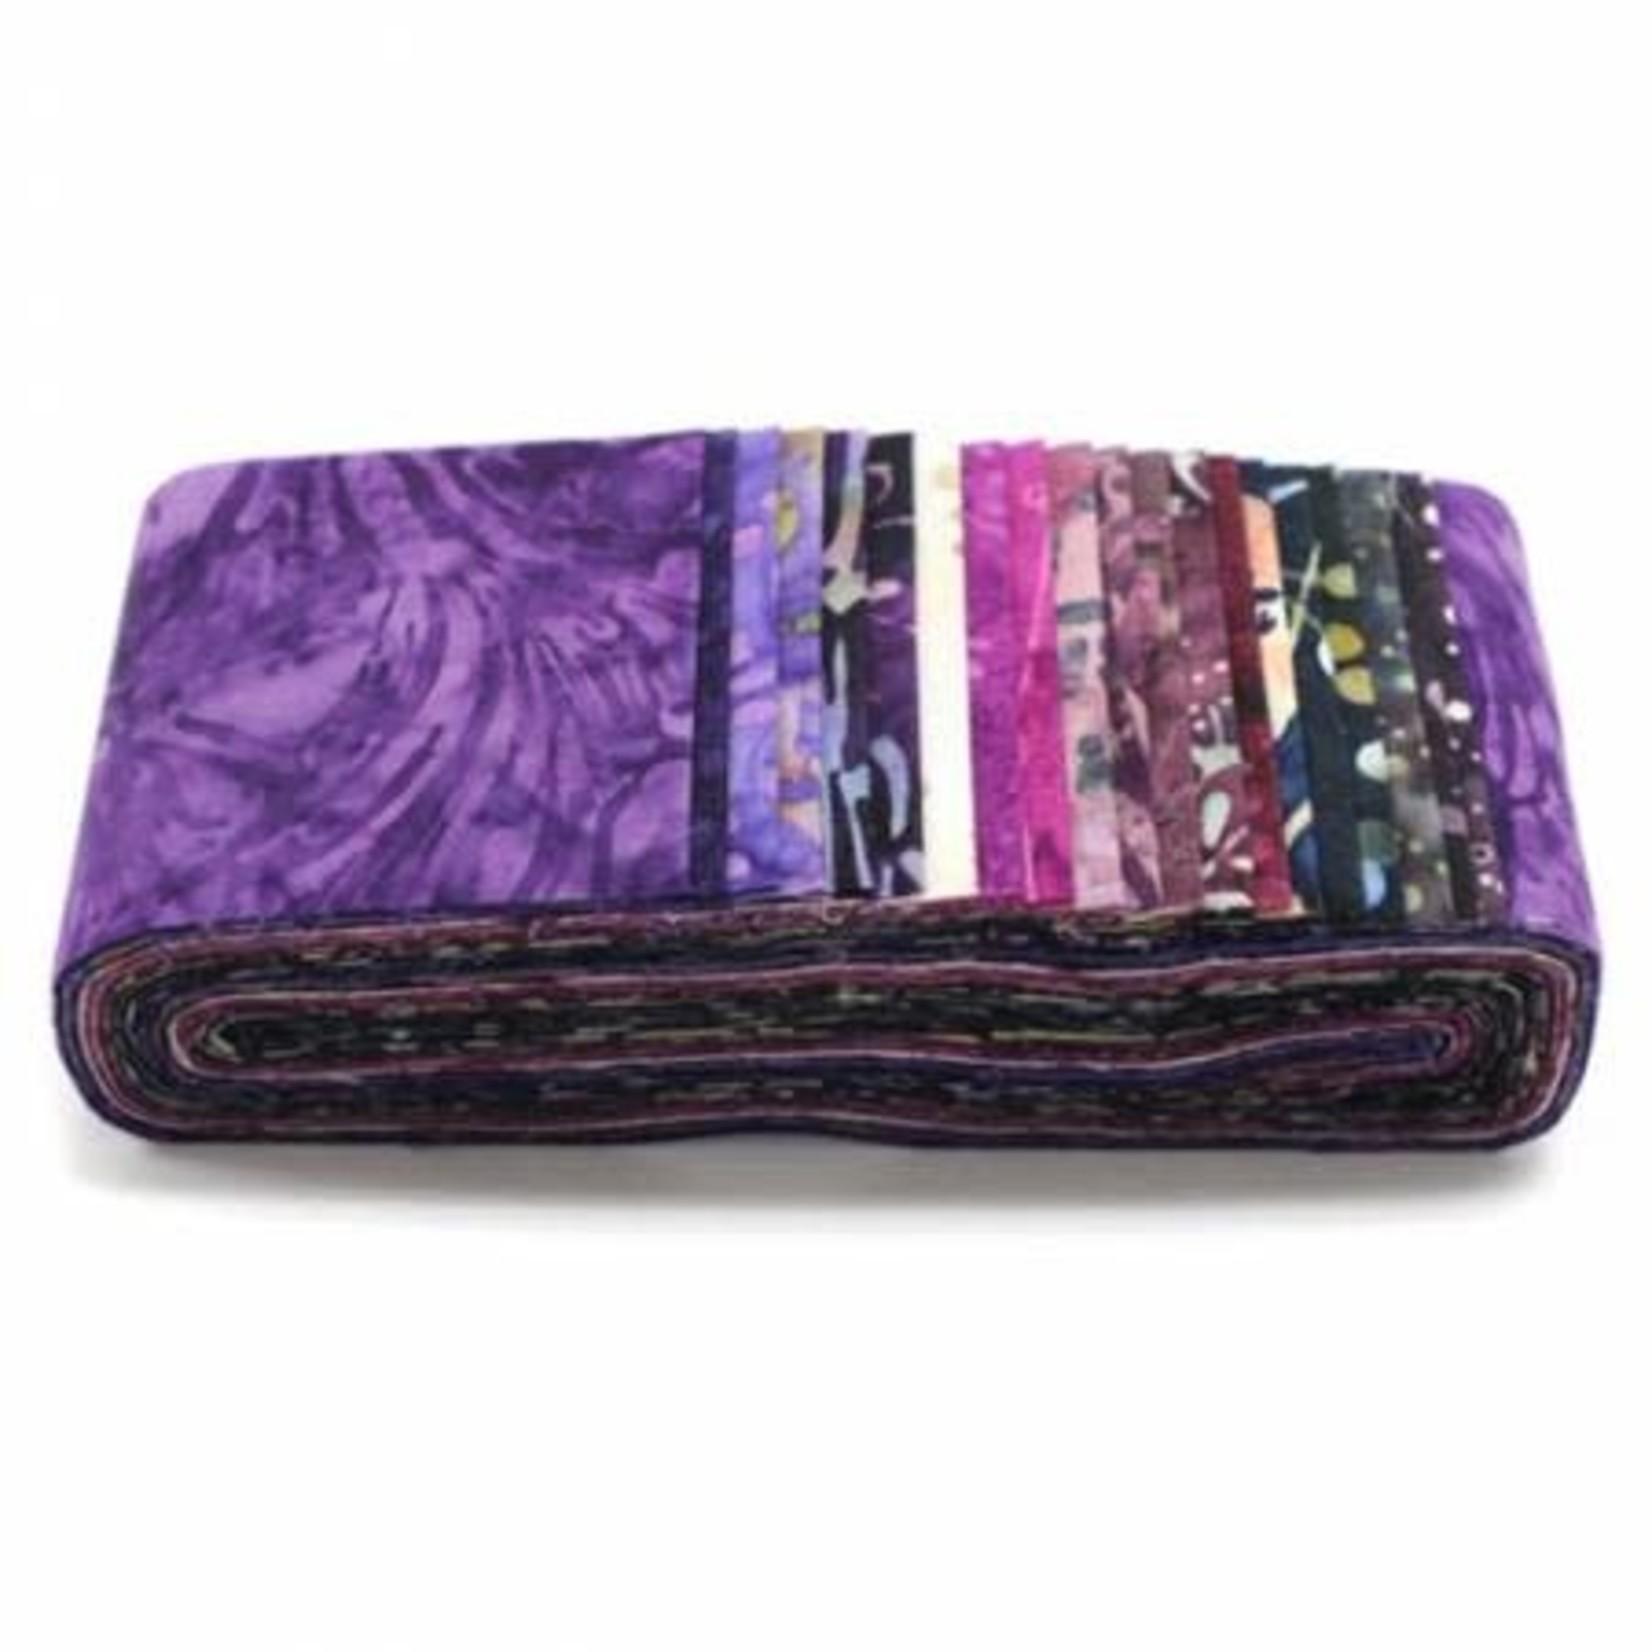 Hoffman Fabrics Napa - Jelly Roll - 20 Stroken